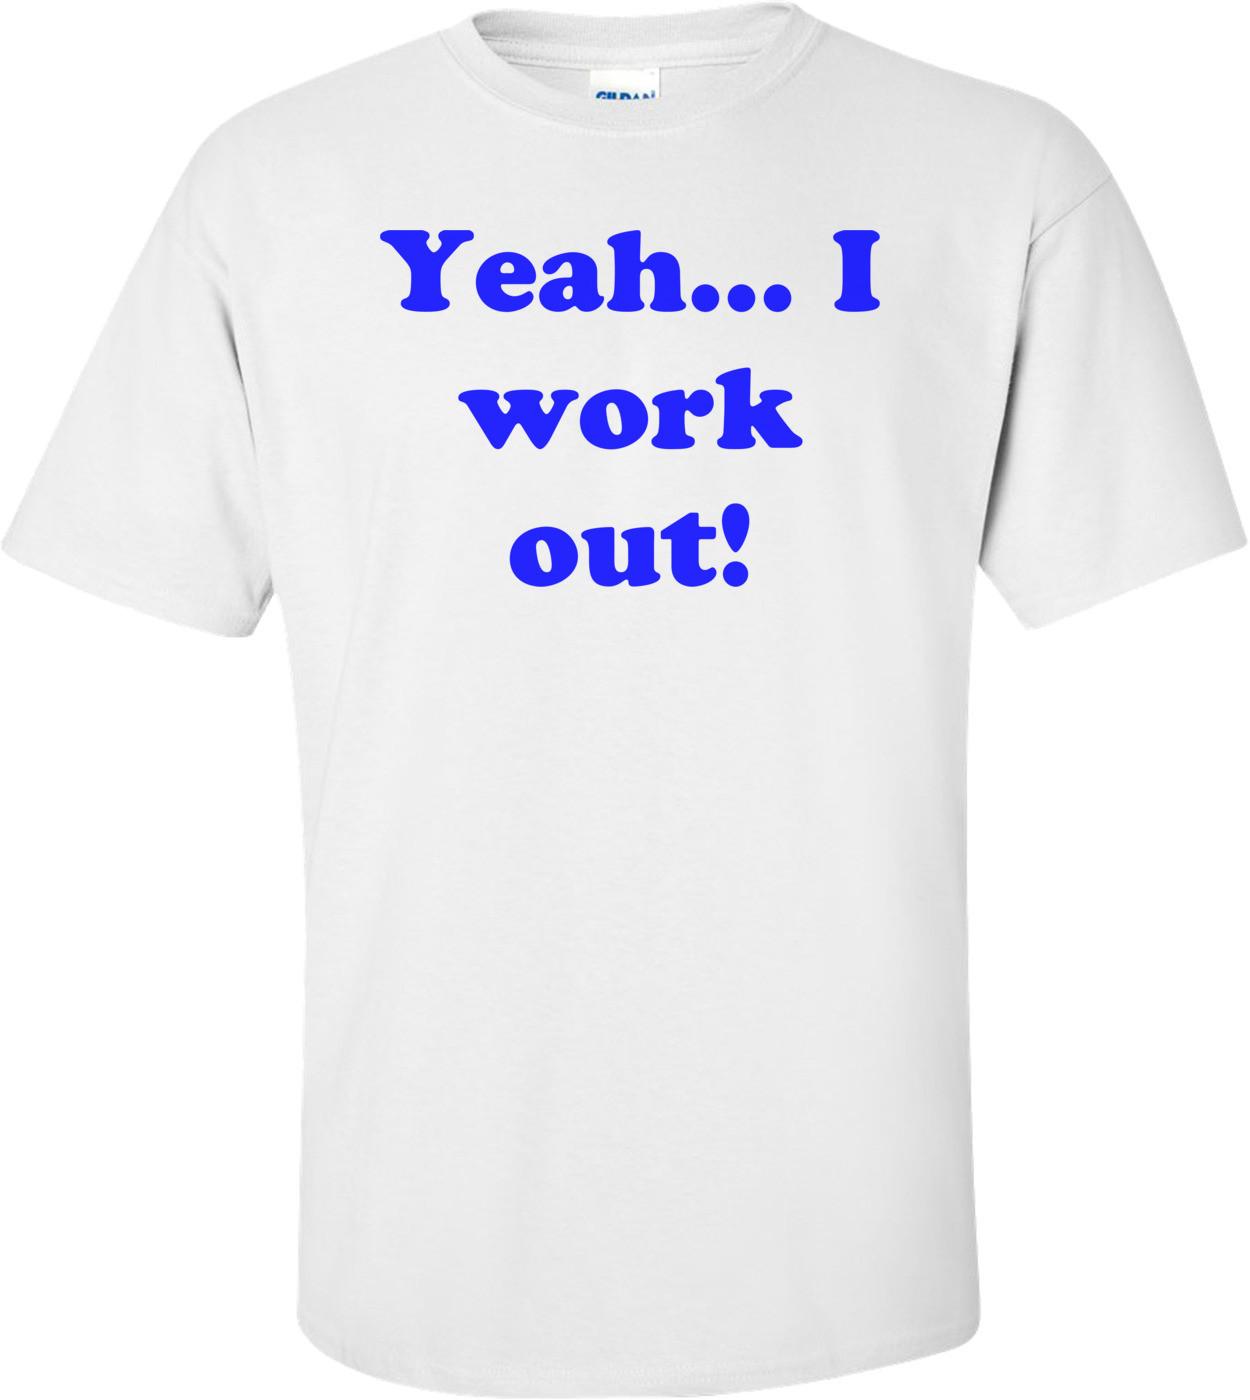 Yeah... I work out! Shirt